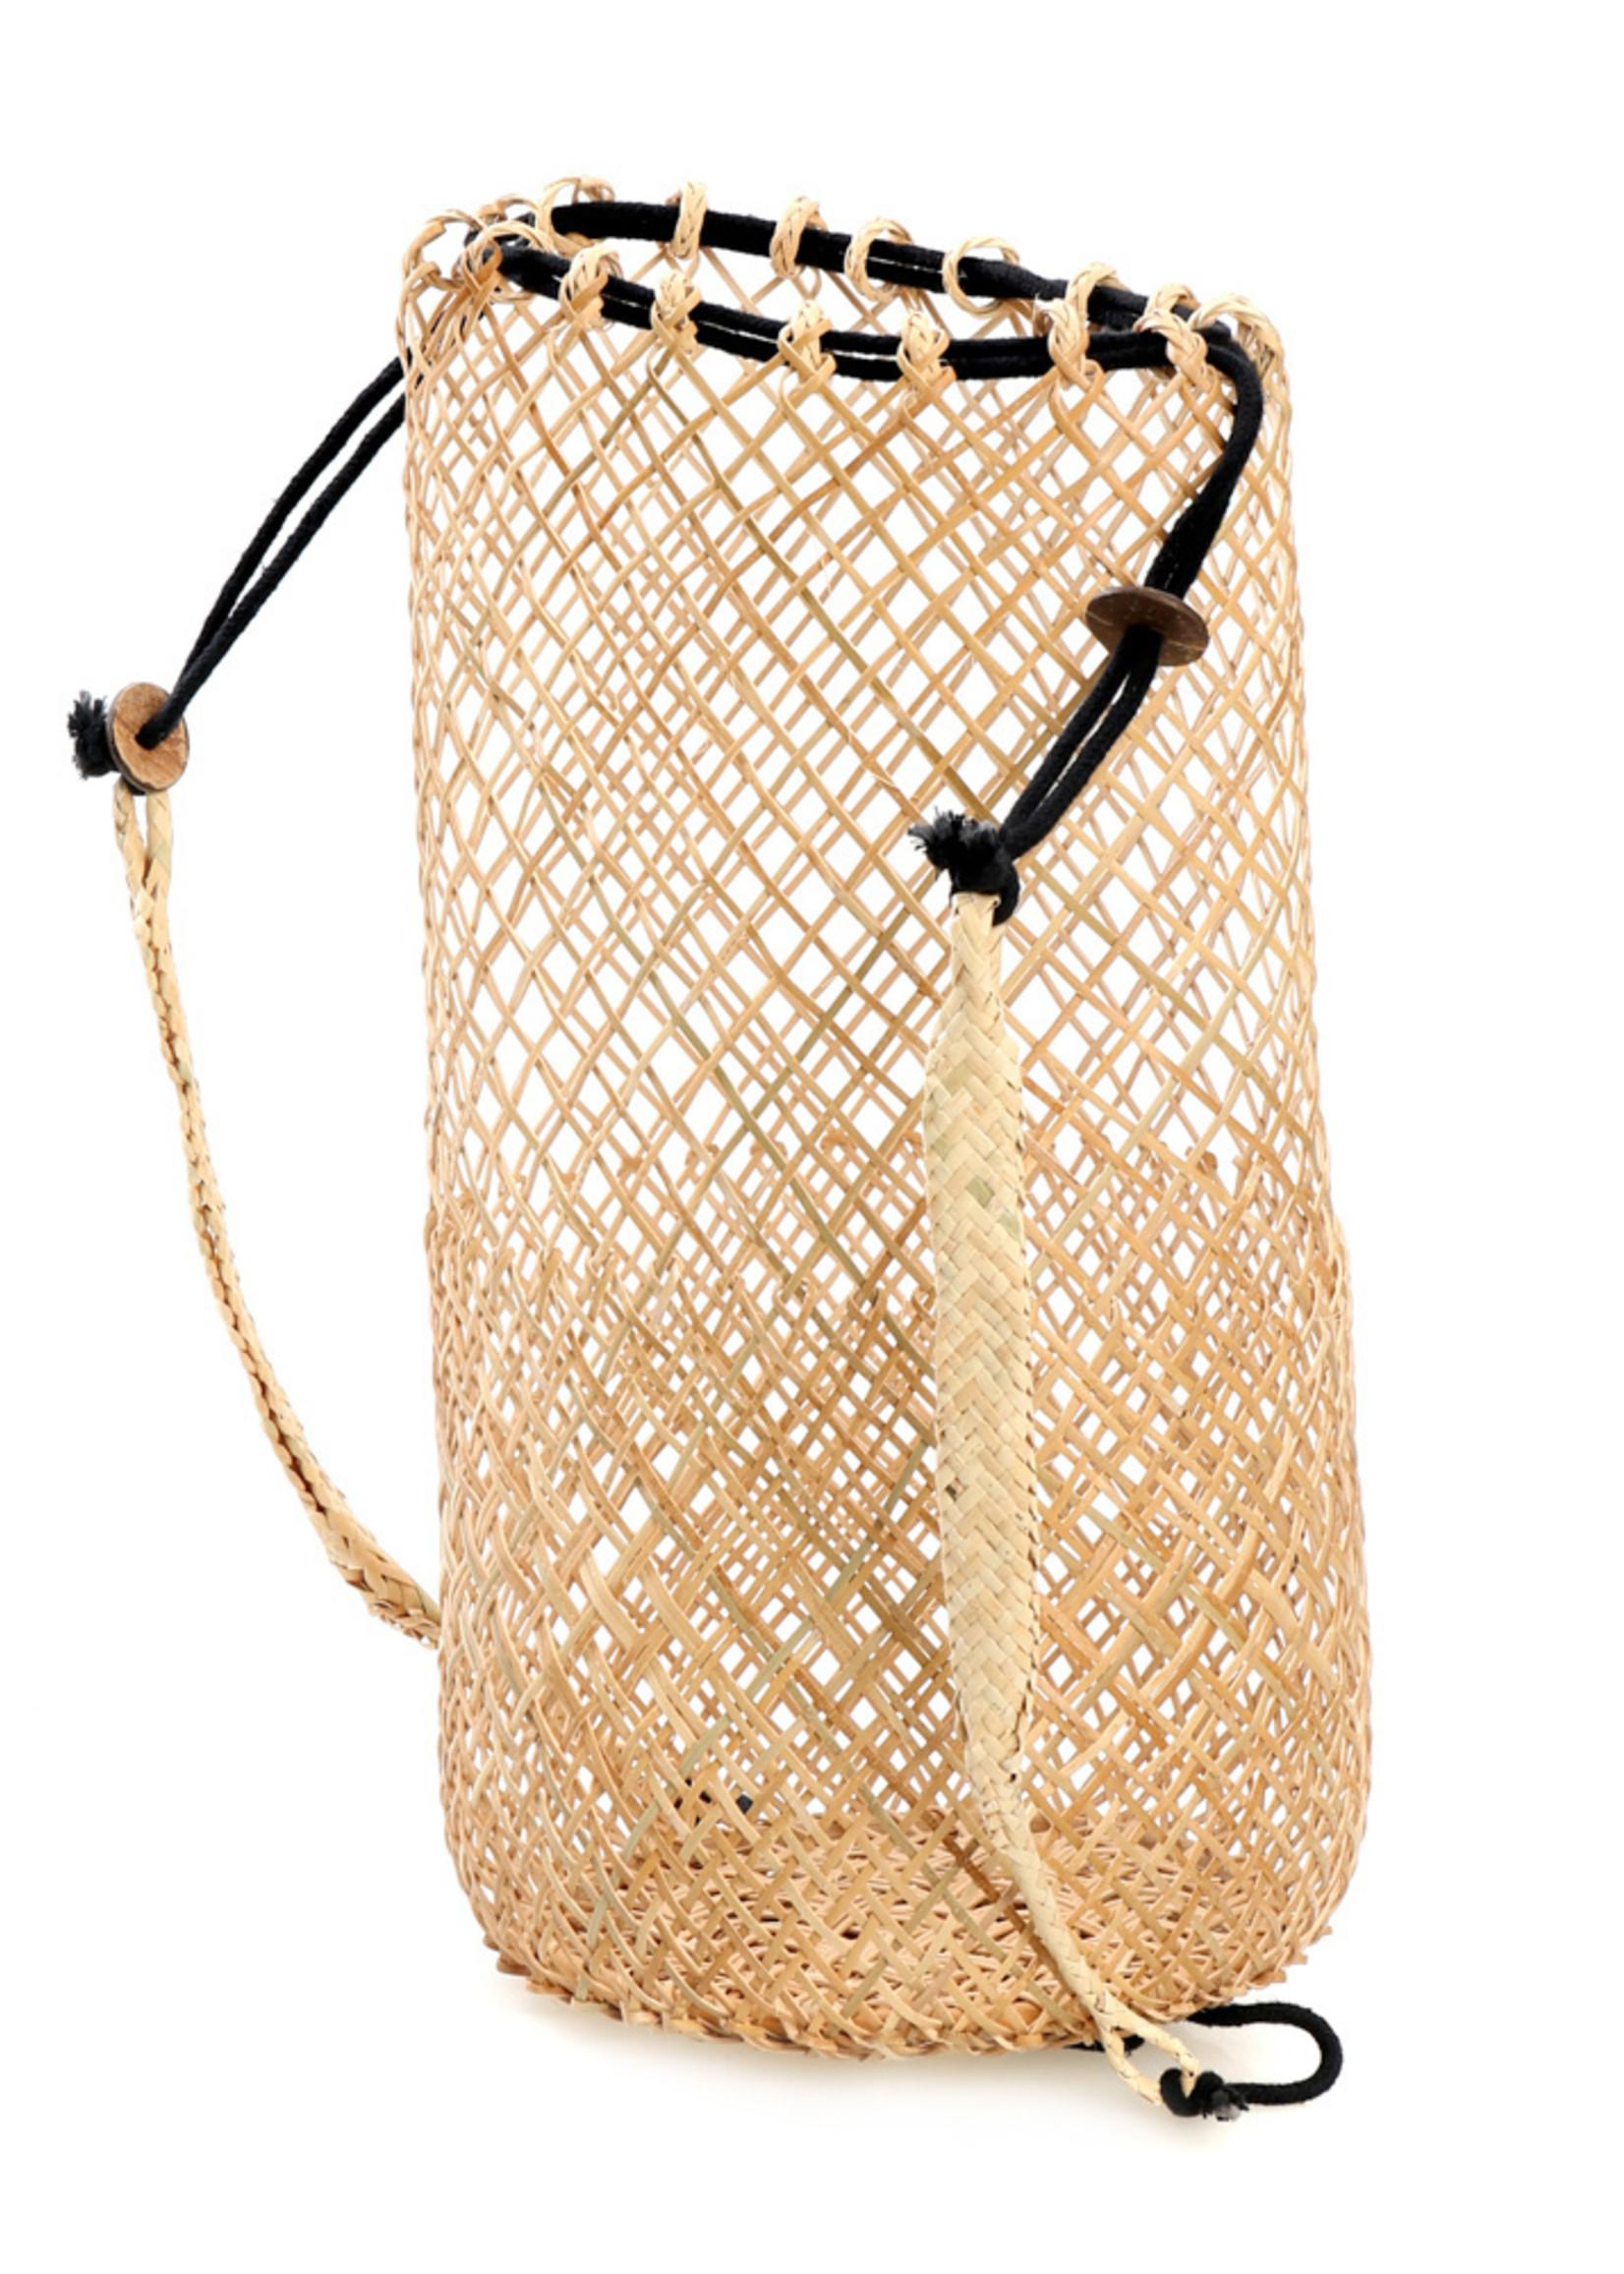 The Fisherman Backpack - Natural